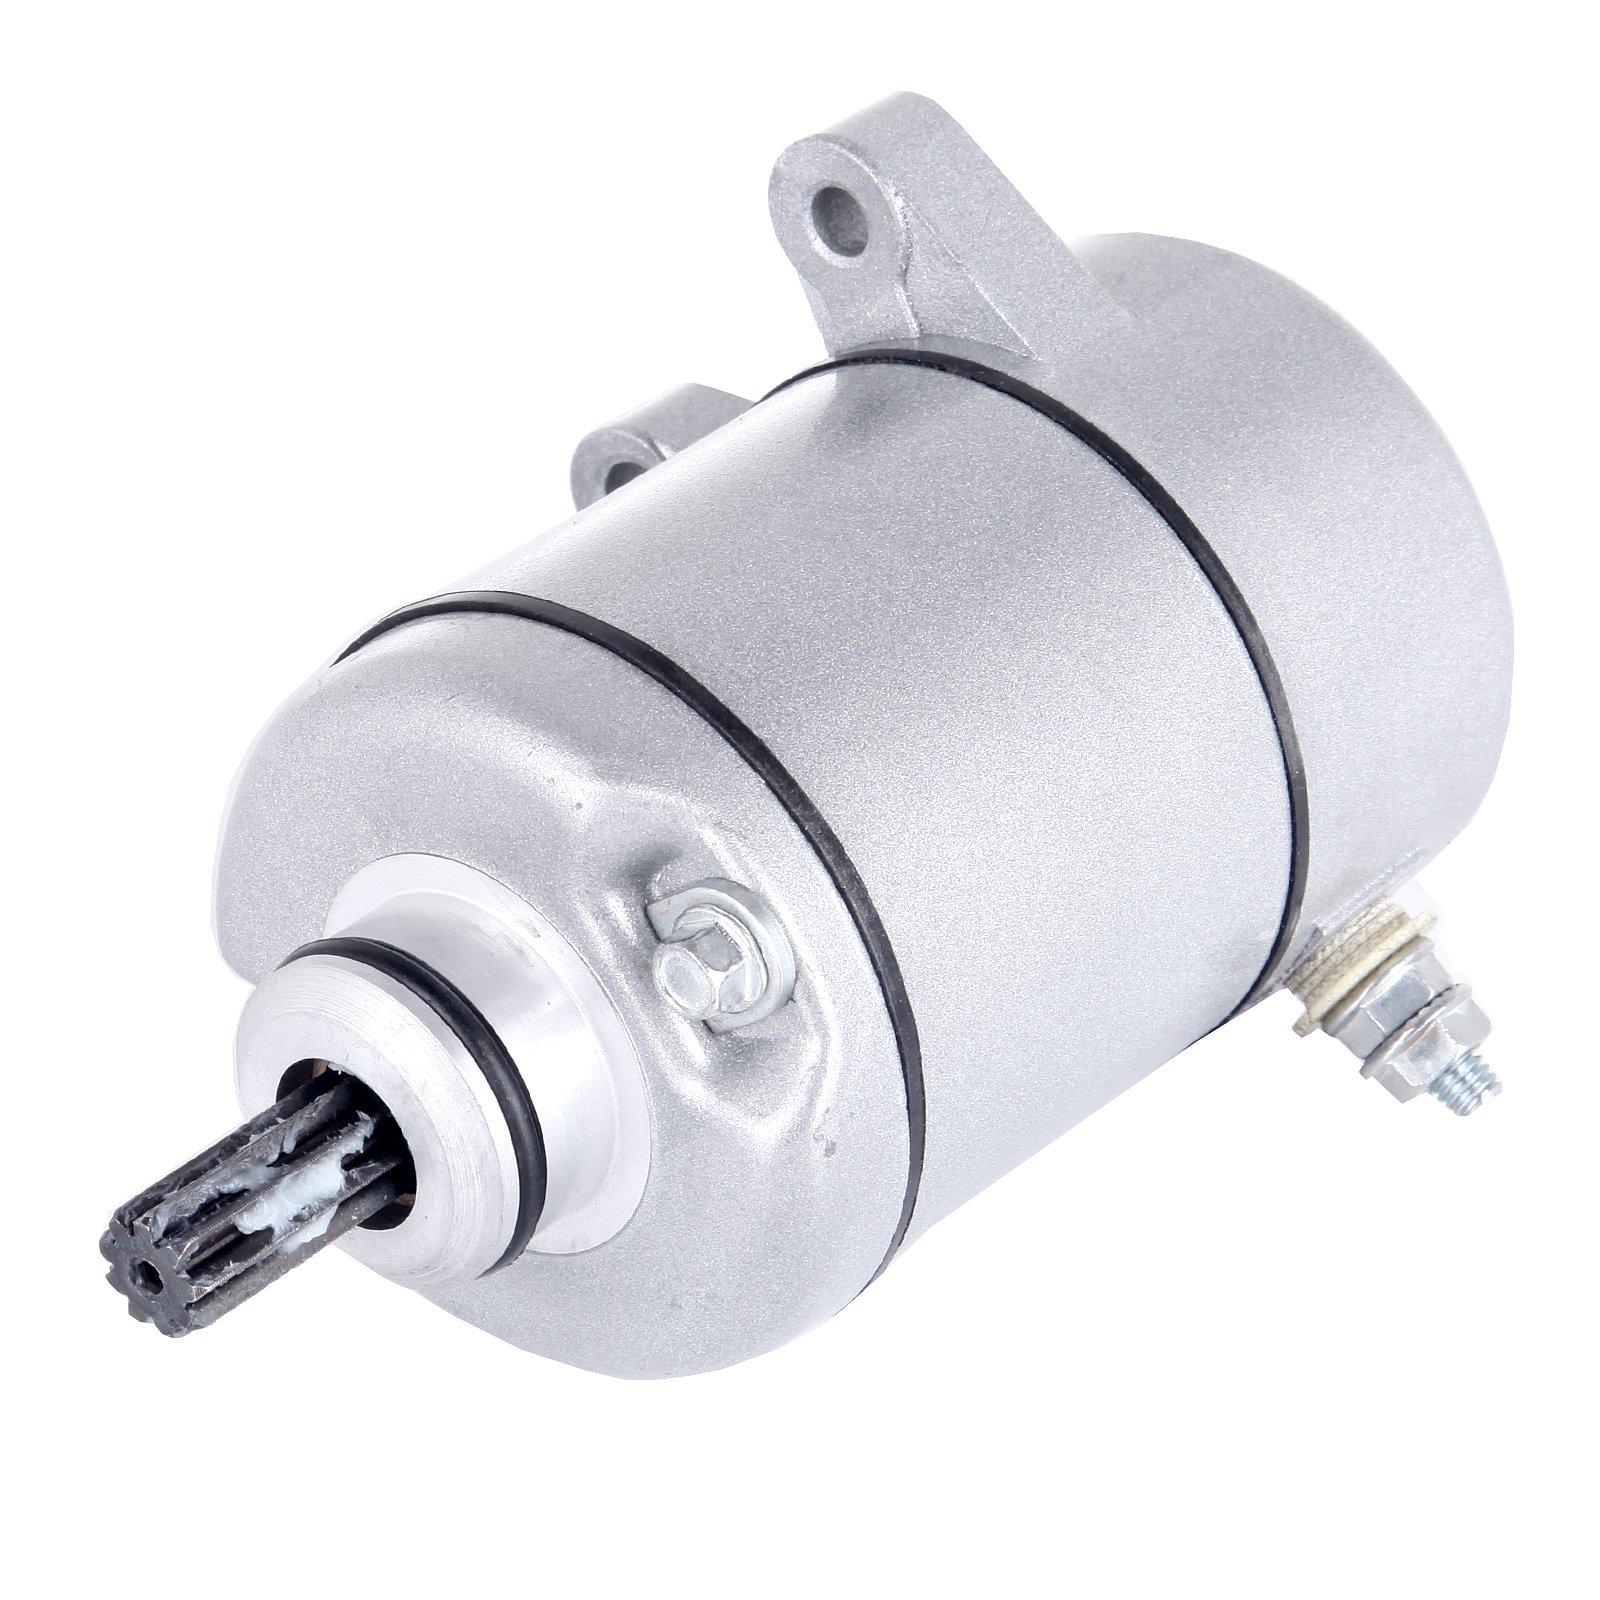 ECCPP Electric Starter Motor For 2000 2001 2002 2003 2004 2005 2006 HONDA TRX350FE TRX350FM TRX350TE TRX350TM RANCHER 4x4 ES 329cc ATV by ECCPP